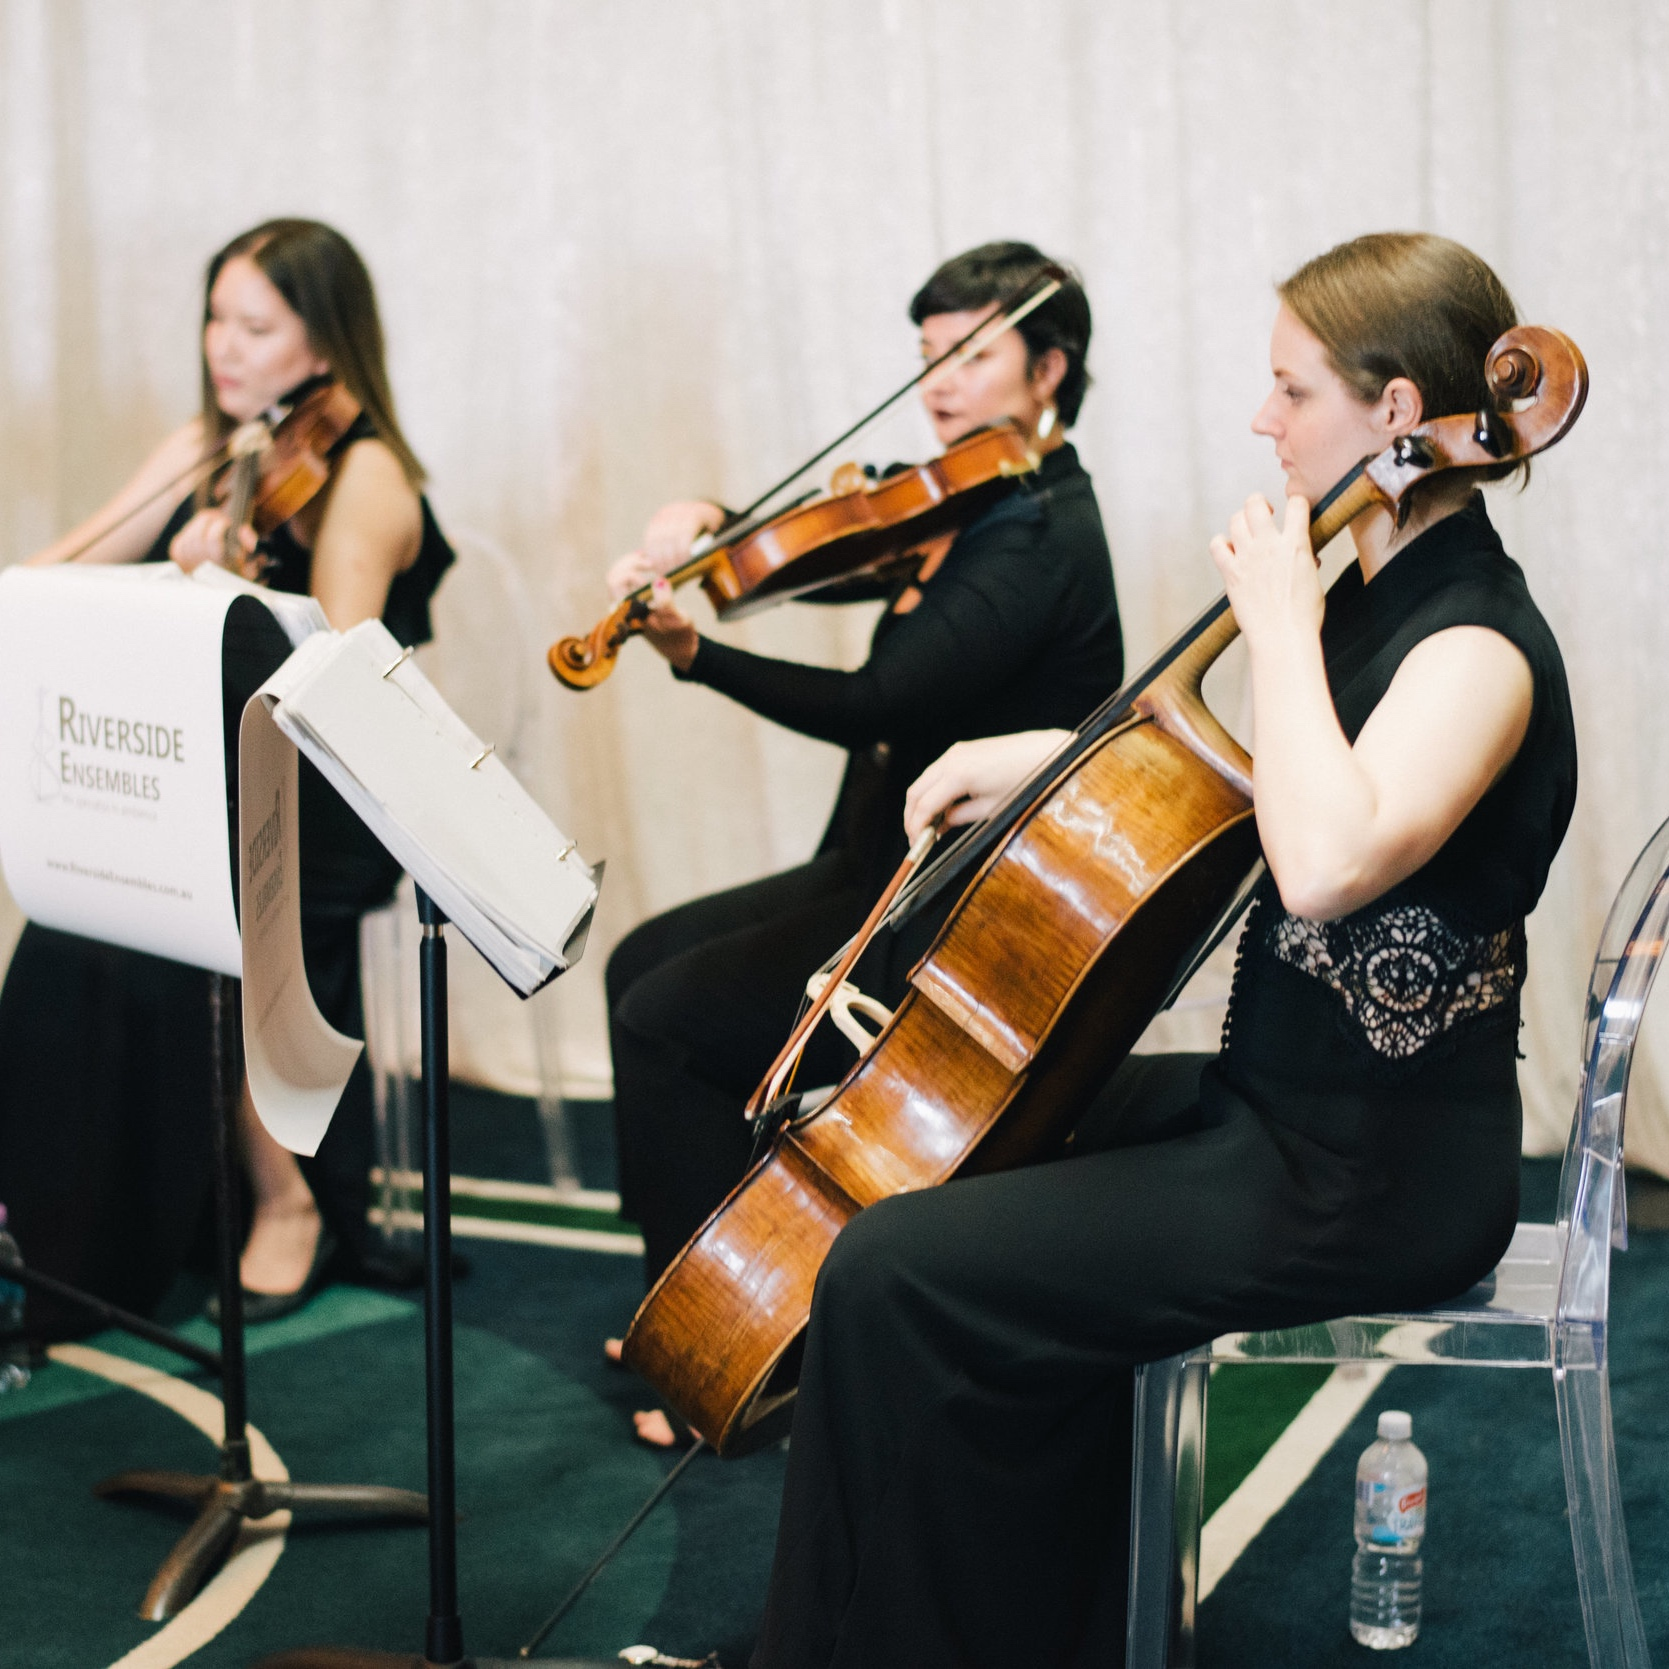 perth-function-string-music-hire-wedding-riverside-musiciansperth-function-string-music-hire-wedding-riverside-musicians-classical-contemporary-violin-viola-cello